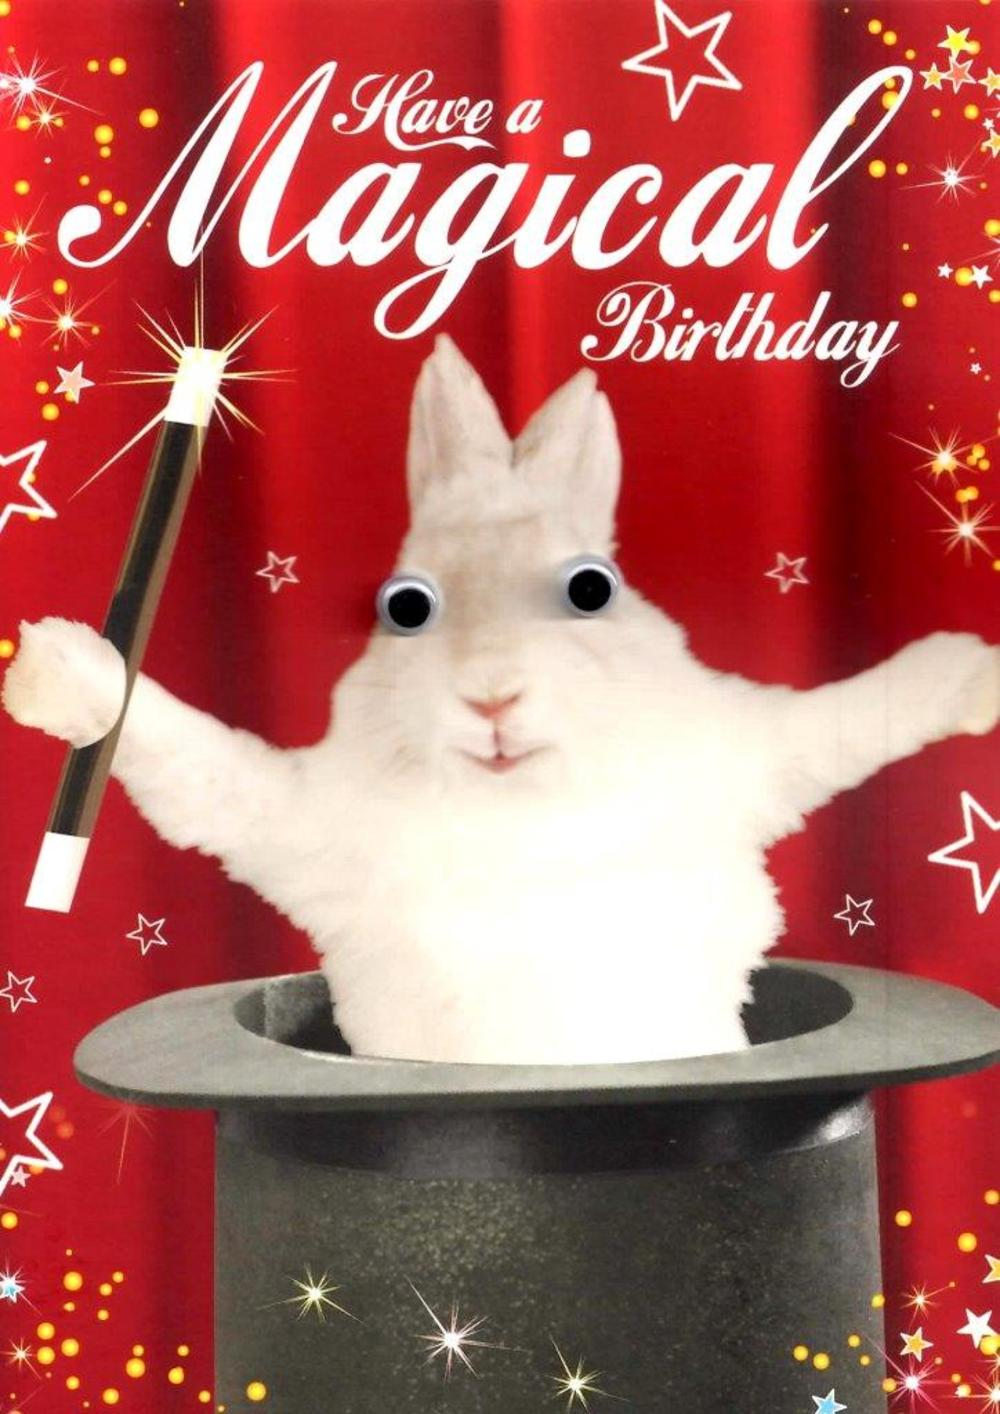 White rabbit googlies magical birthday card cards love kates white rabbit googlies magical birthday card kristyandbryce Images